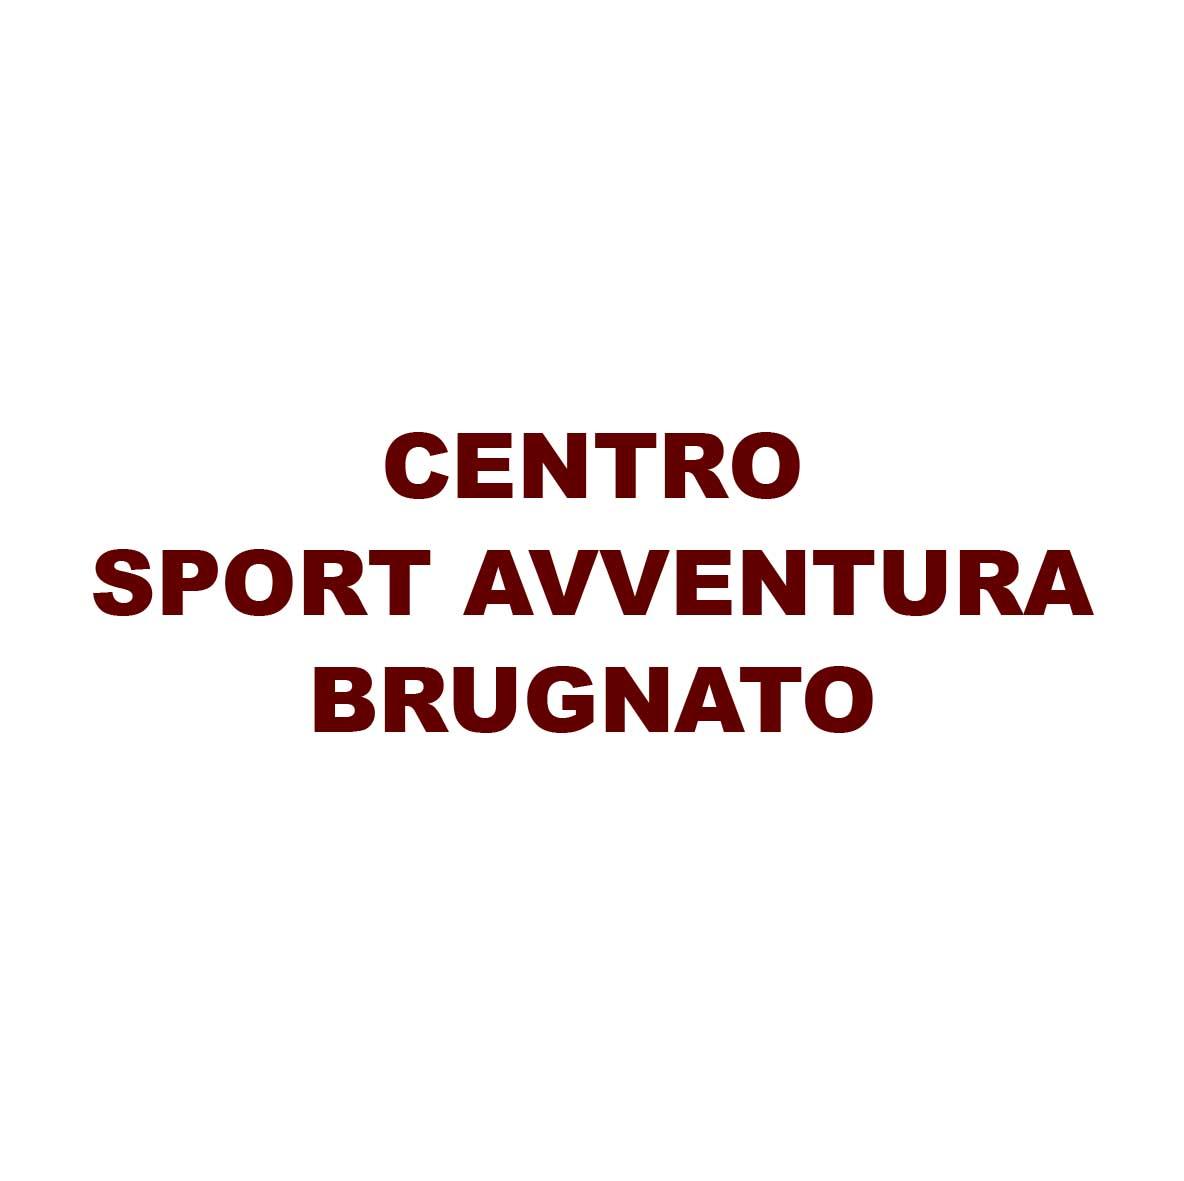 CENTRO SPORT AVVENTURA BRUGNATO